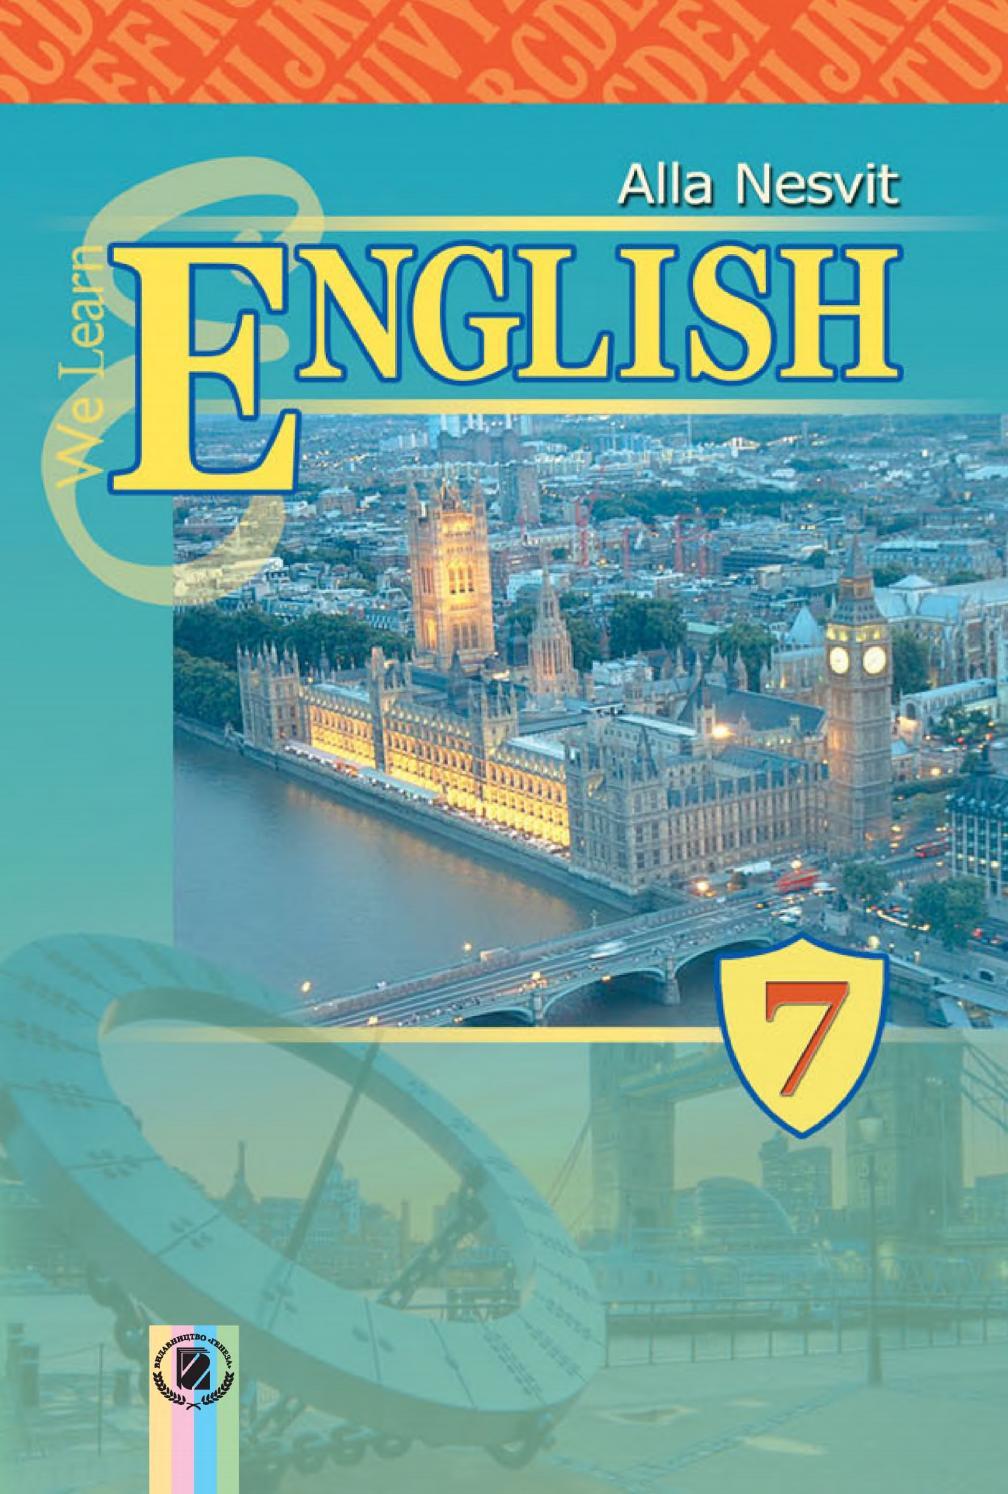 7 klas anglijska mova nesvit 2015 by uploader12283222 - issuu